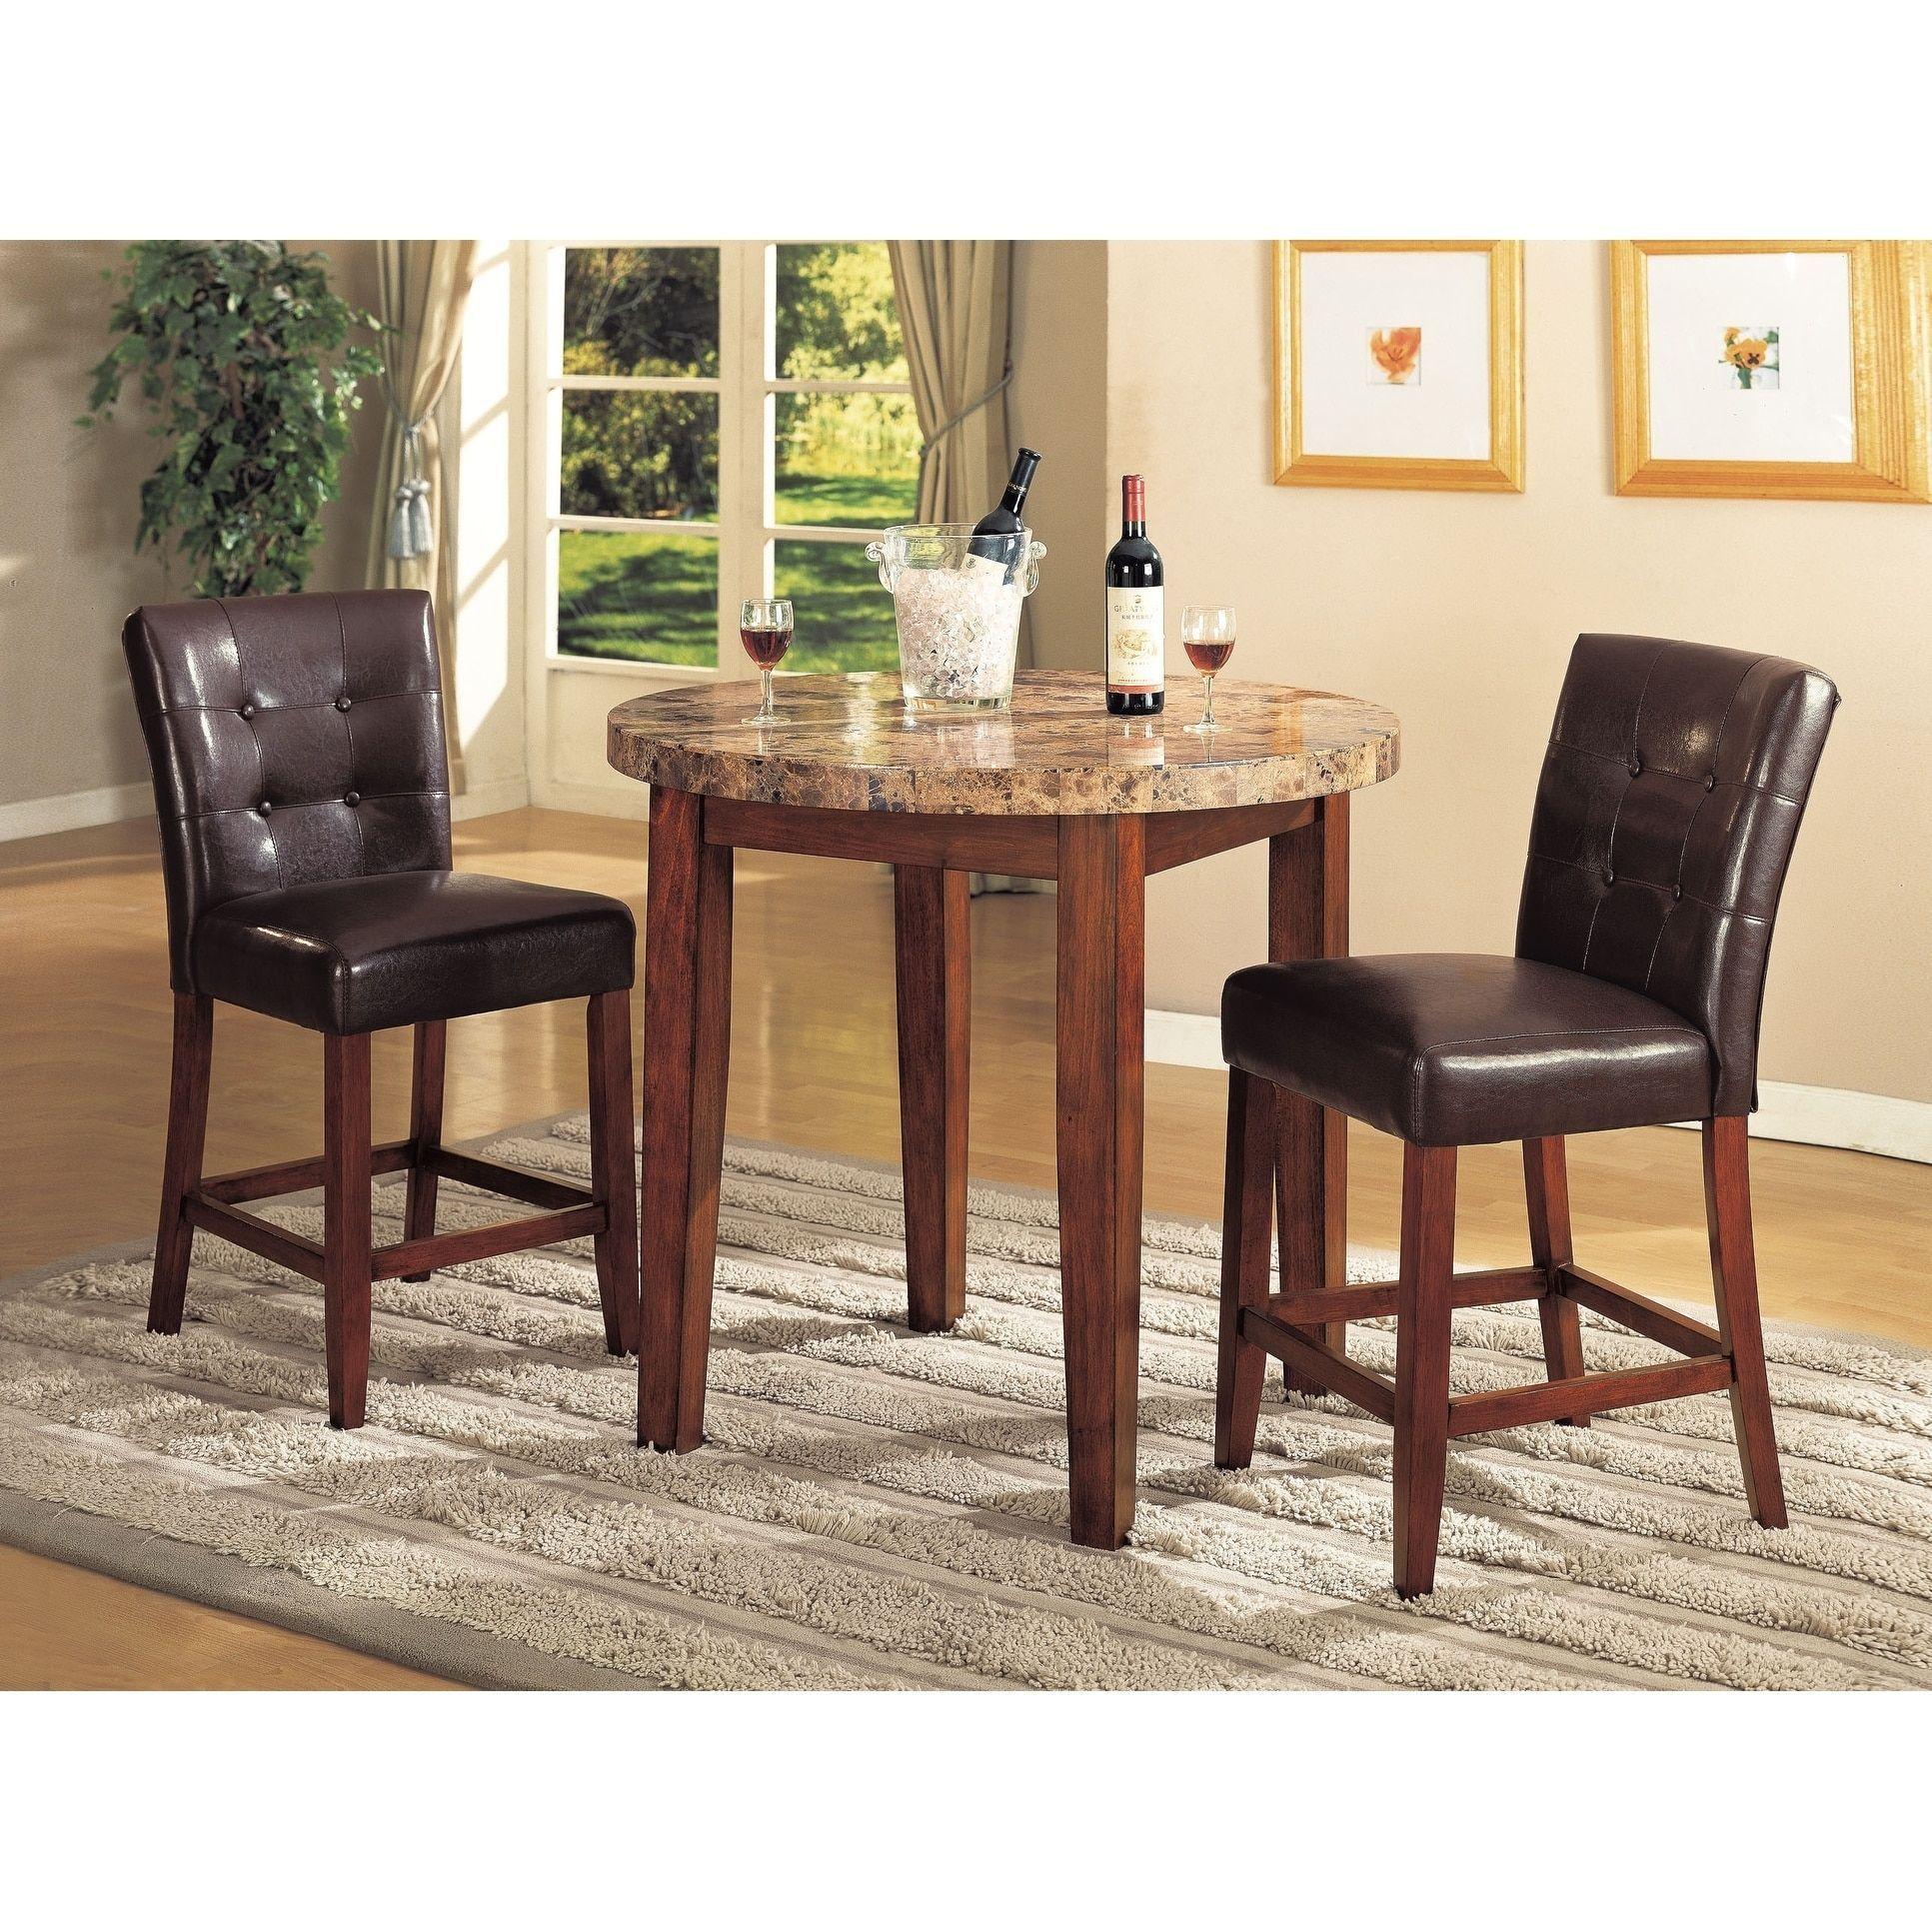 Benzara bologna brown cherry wood counterheight table with brown